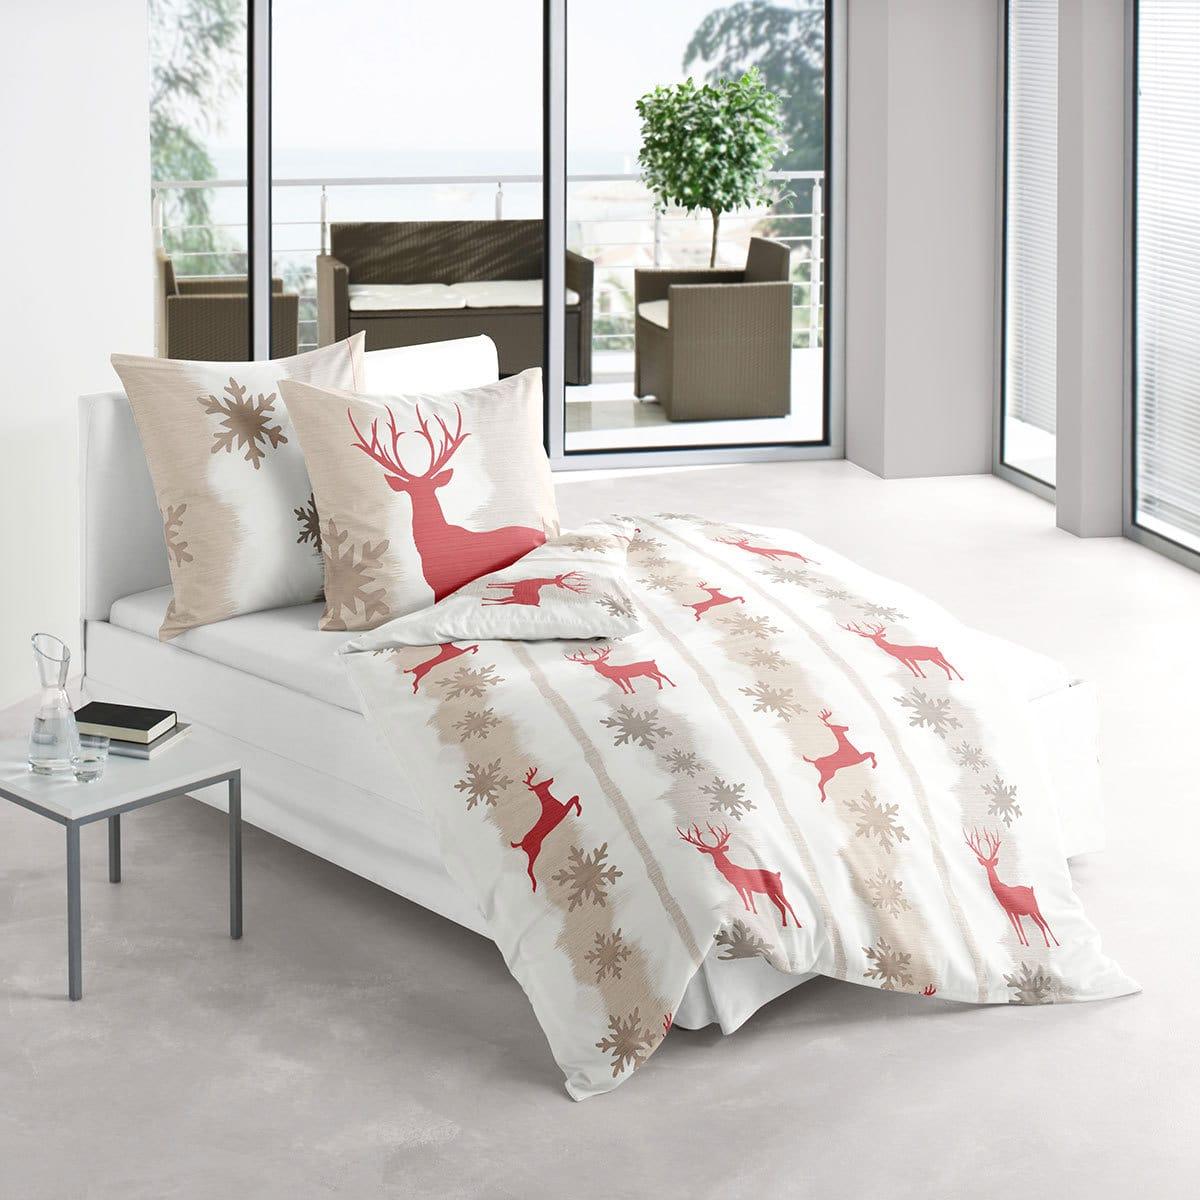 irisette biber bettw sche dublin 8681 80 g nstig online kaufen bei bettwaren shop. Black Bedroom Furniture Sets. Home Design Ideas